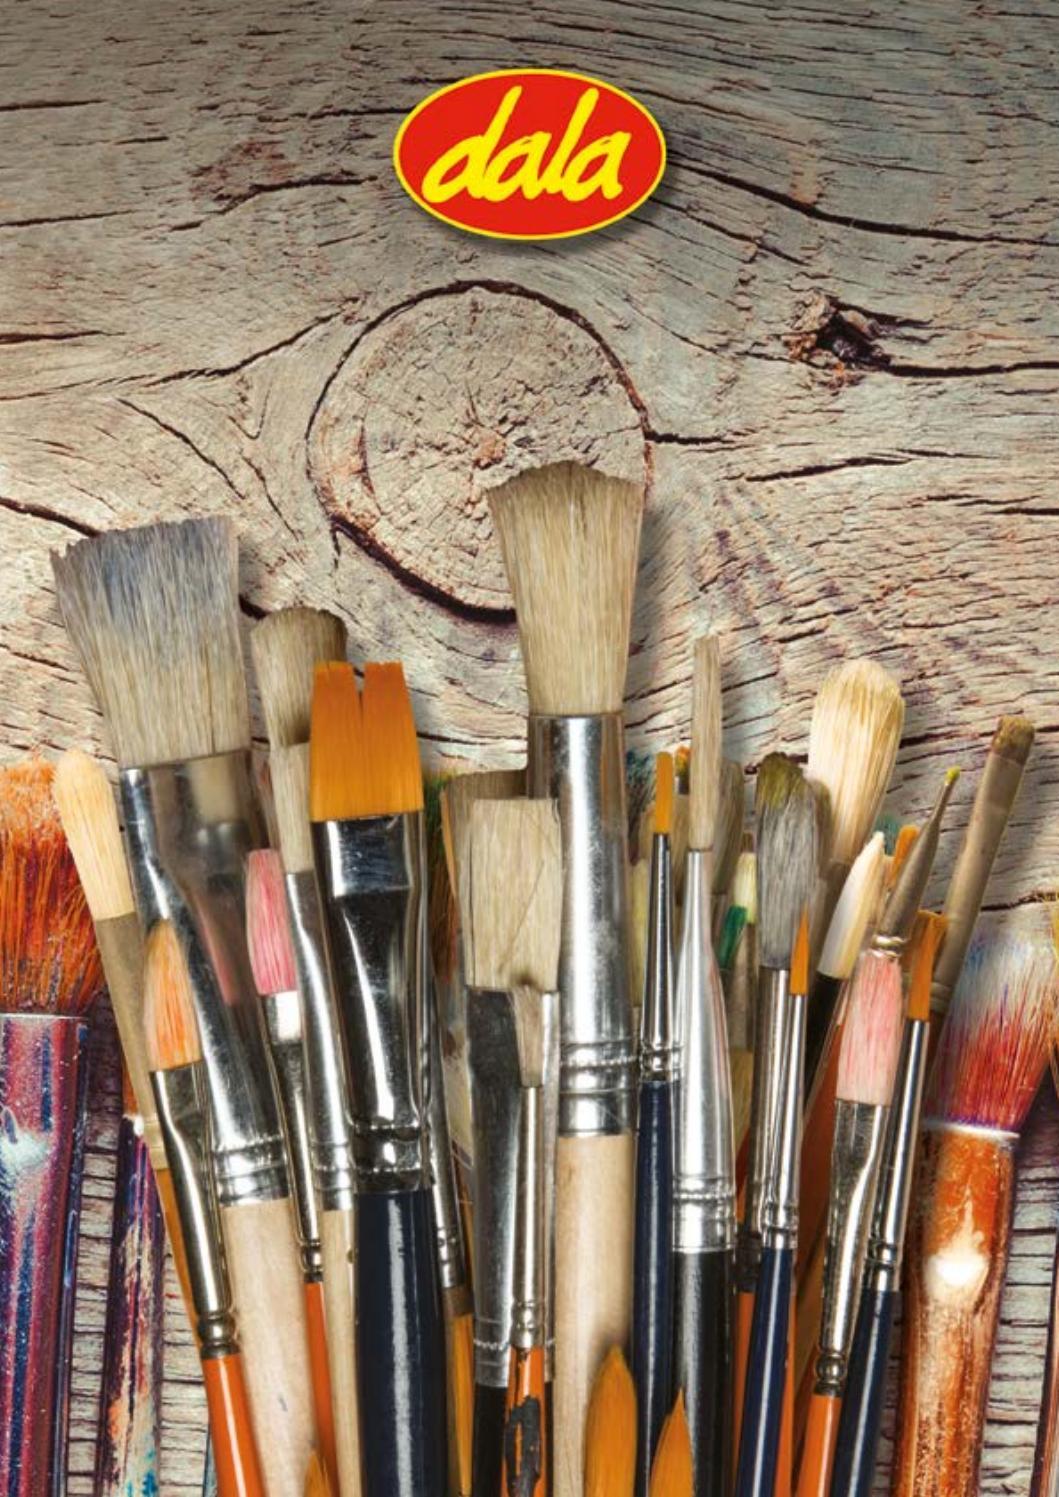 Eono EonoEssentials Foam Brush Set of 6 Stamp Painter,Sponges Brush Set for Kids Wood Handle